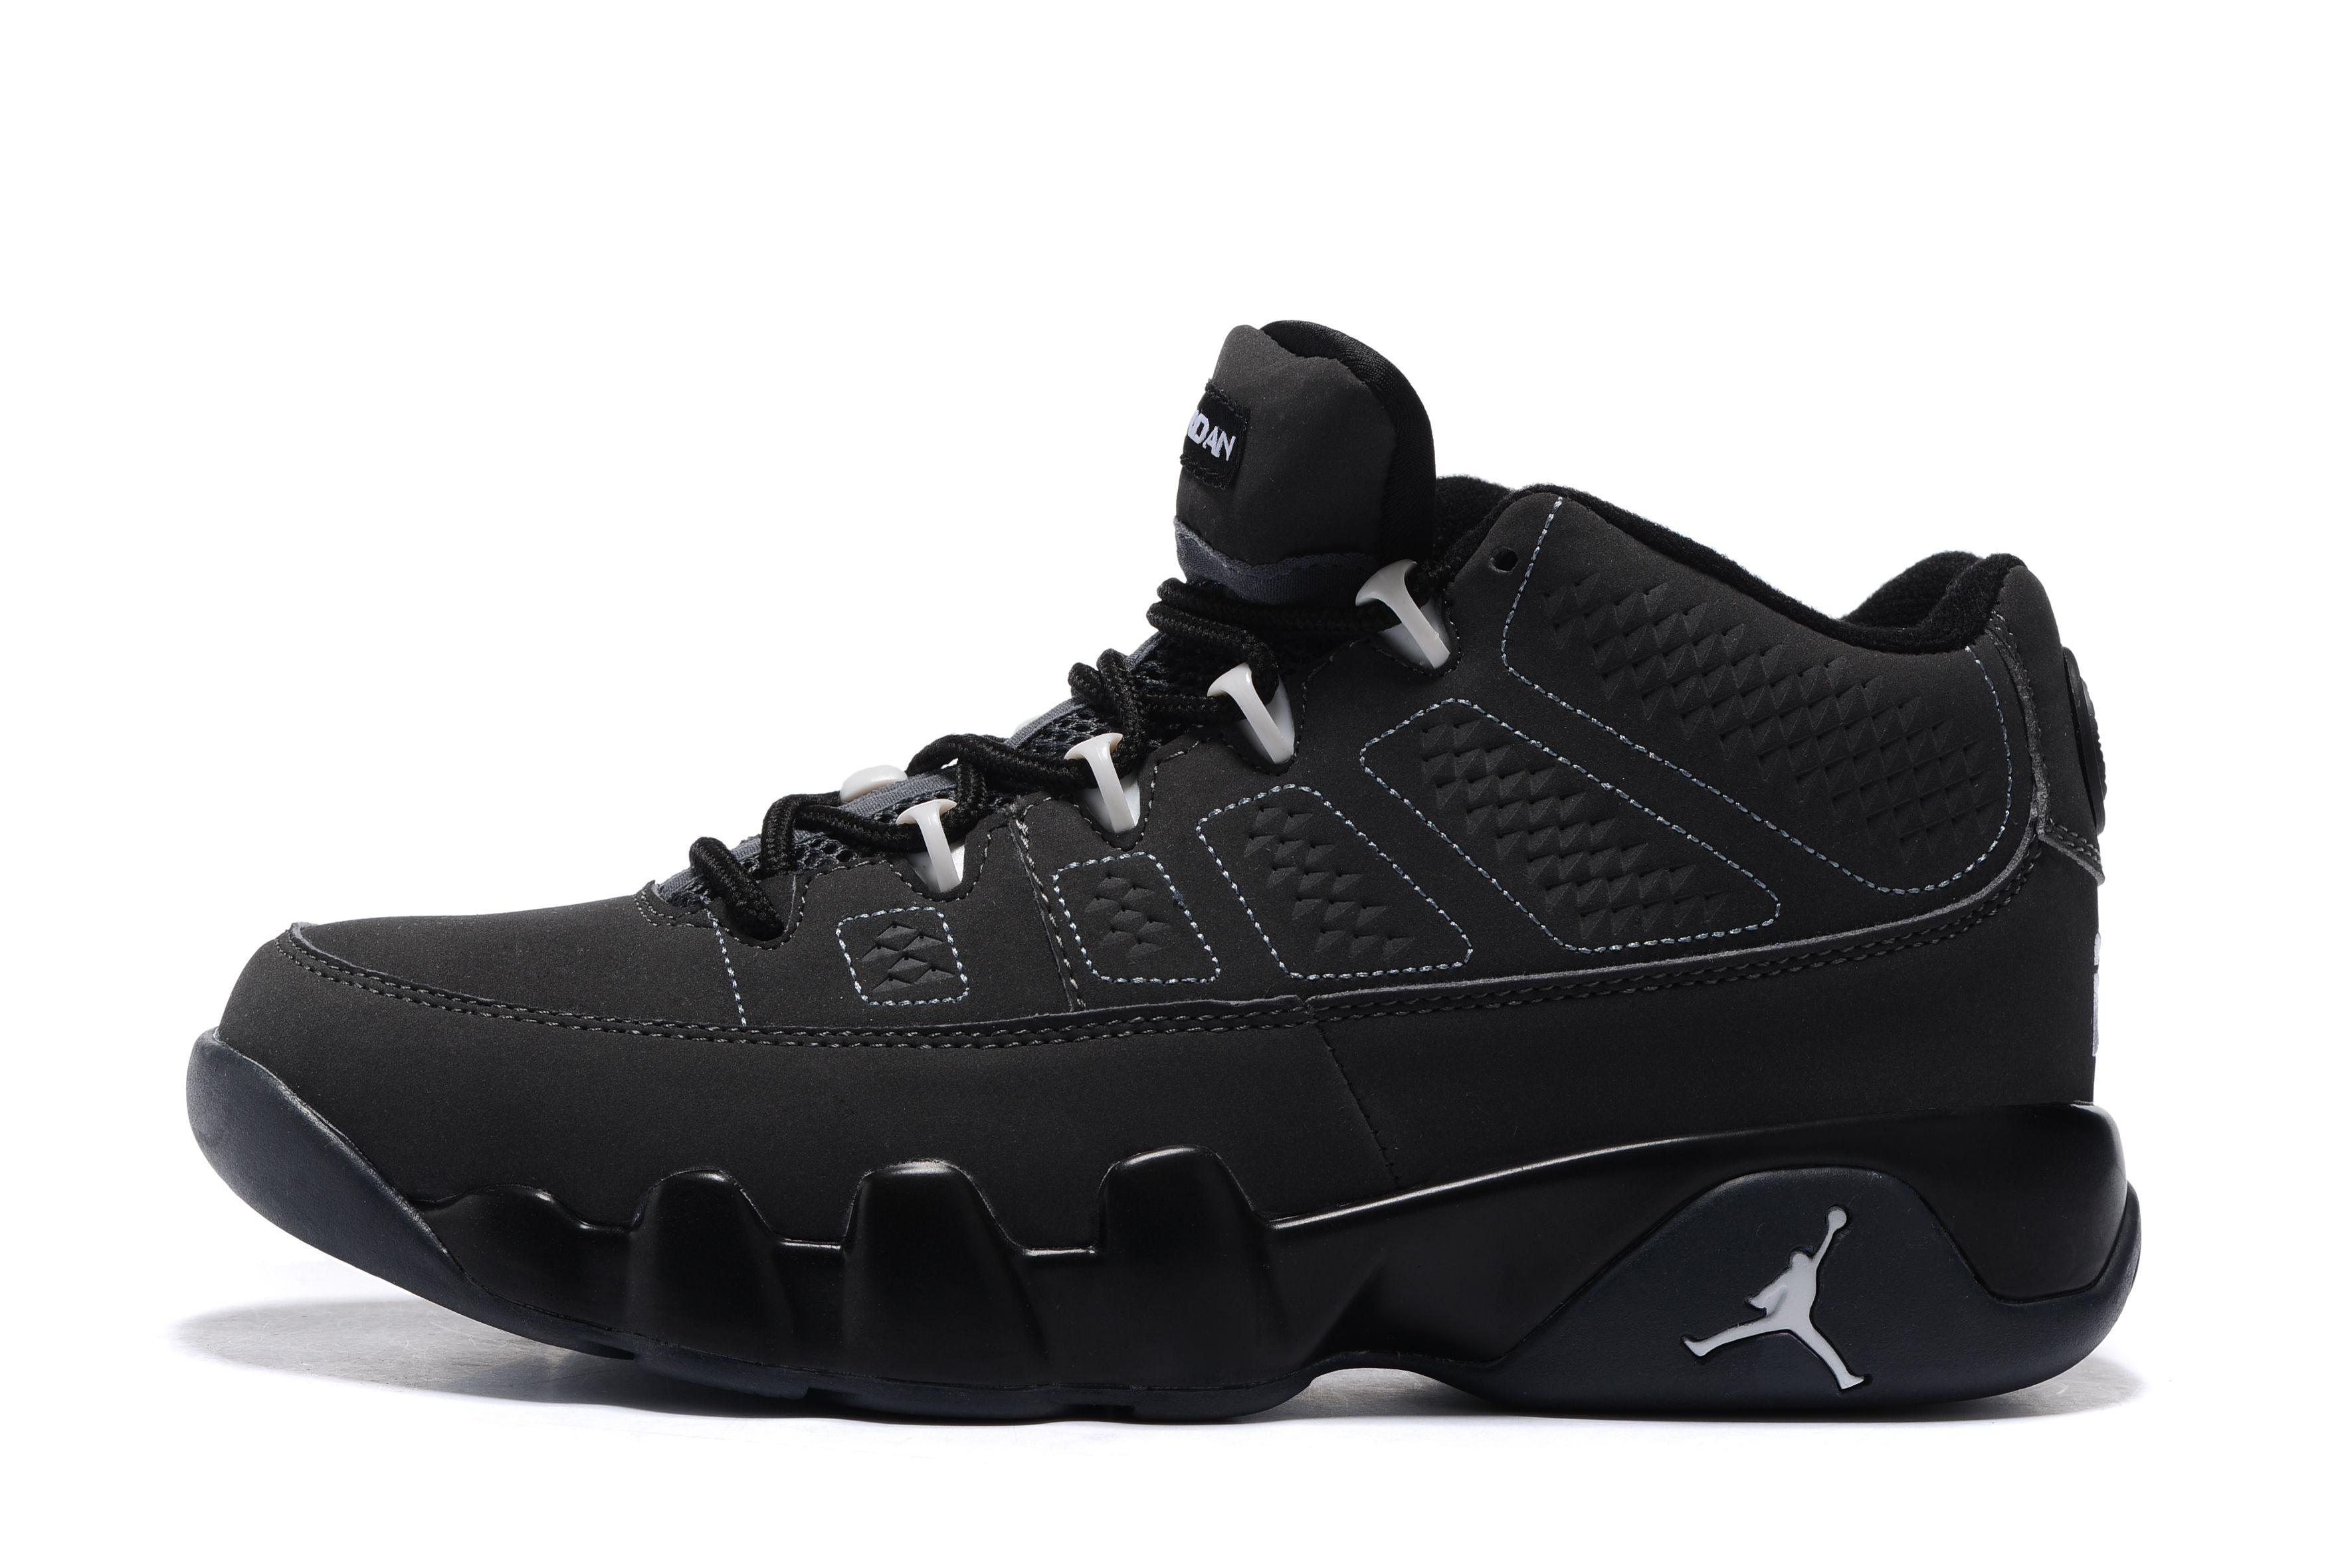 Factory Nike Air Jordan 9 Retro Low Black White Sport